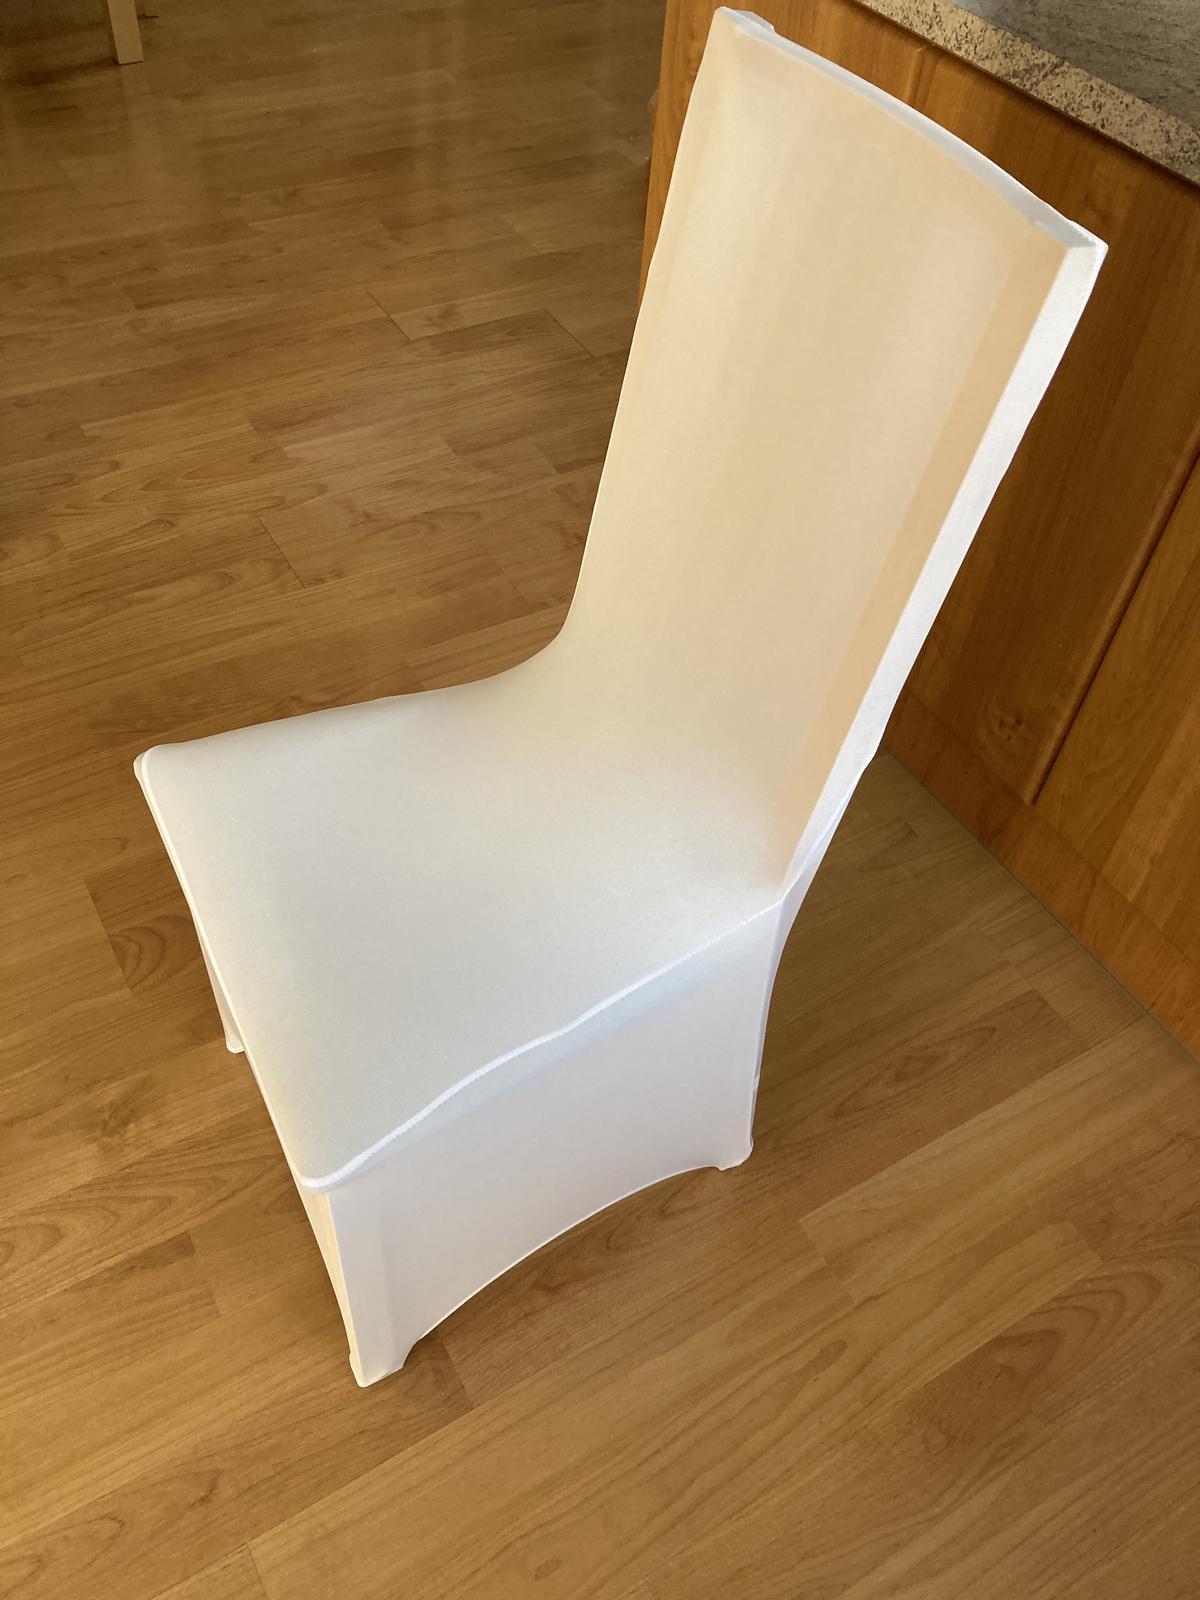 spandexove potahy na židle - Obrázek č. 1